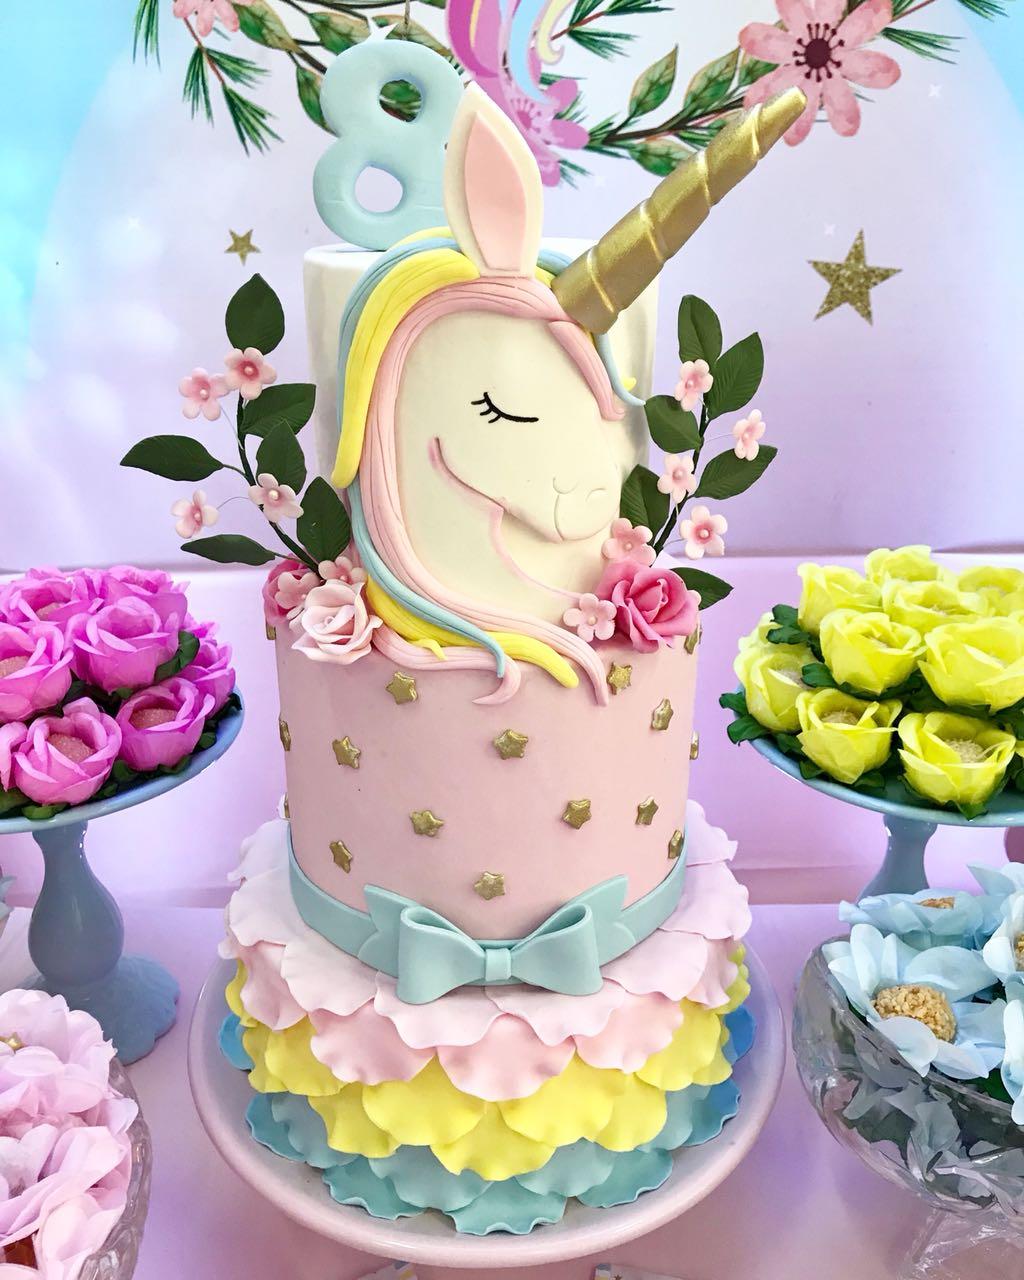 Torta Unicornio Decoraciones Tematicas